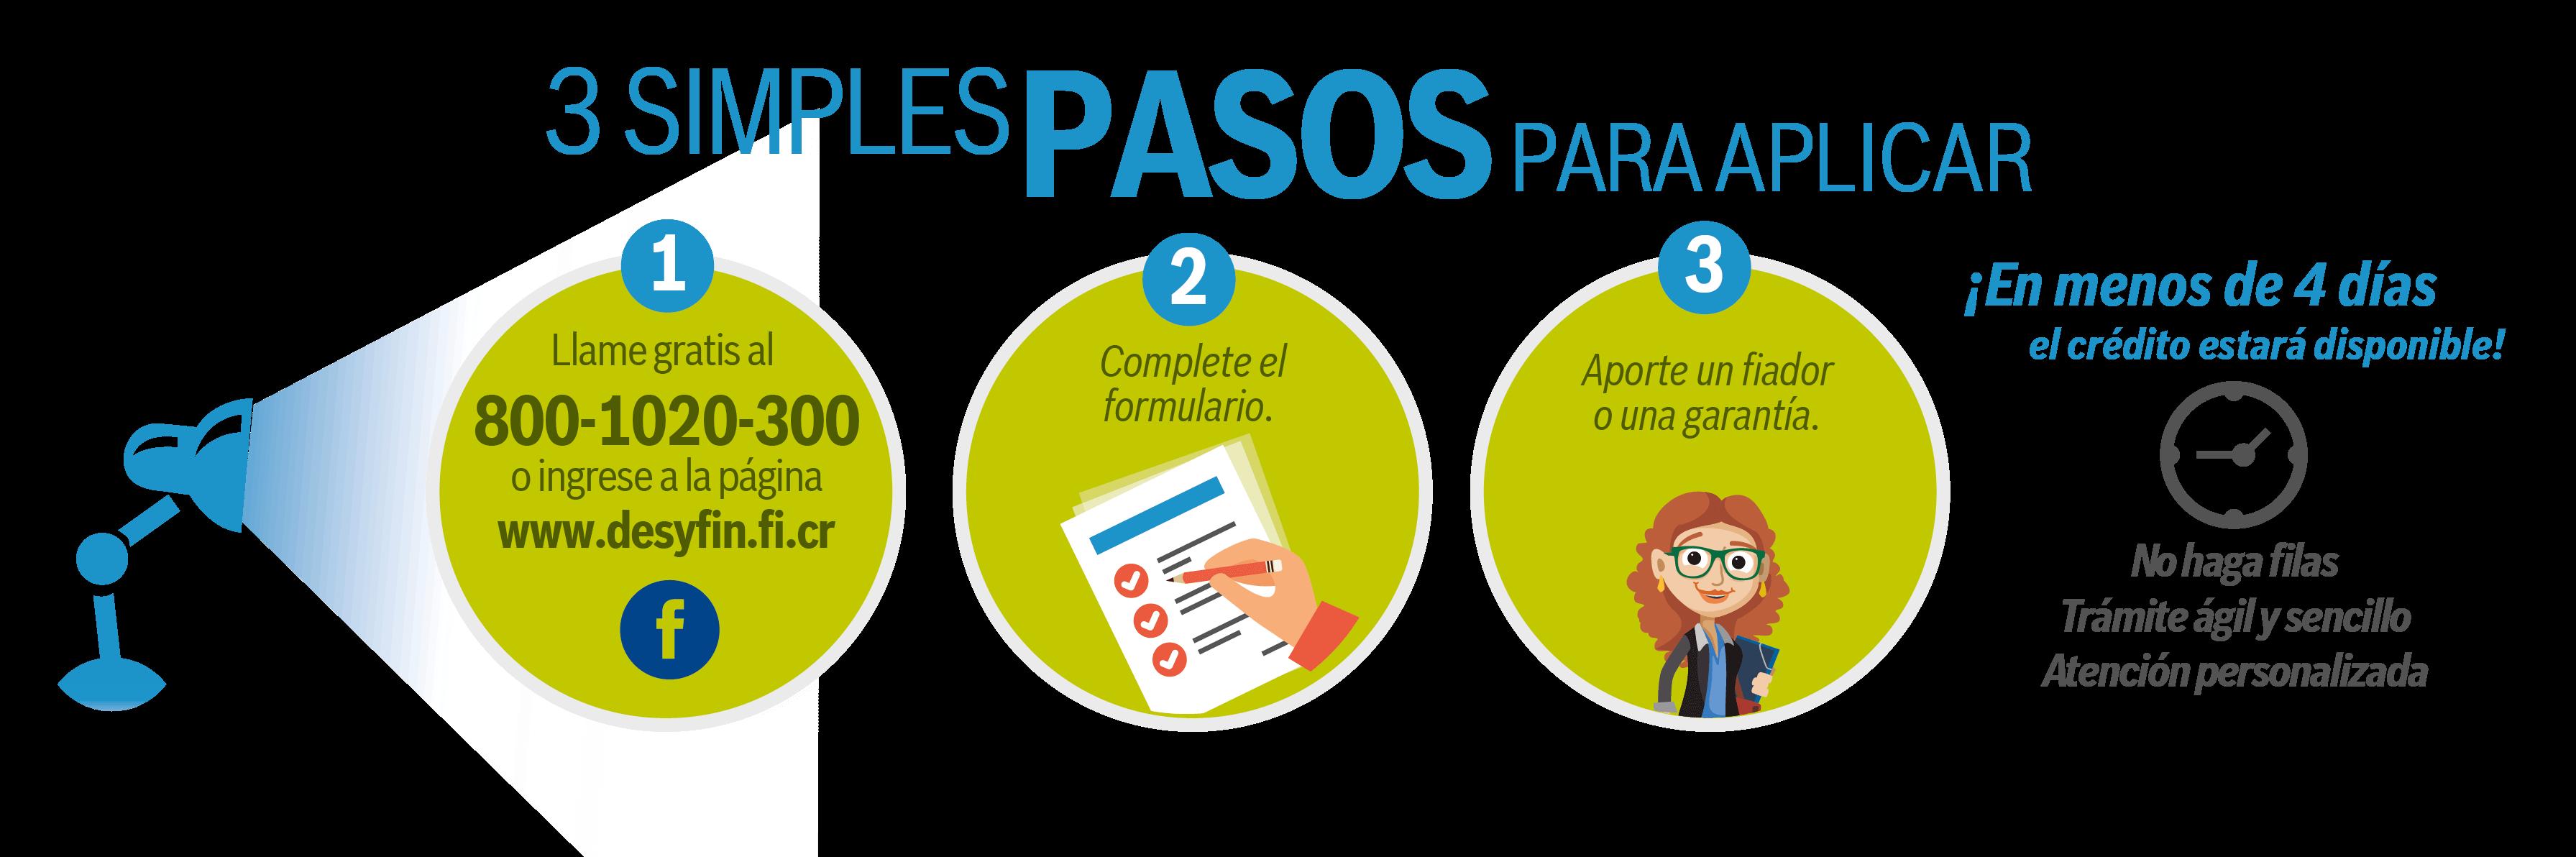 3 SIMPLES PASOS-01-01